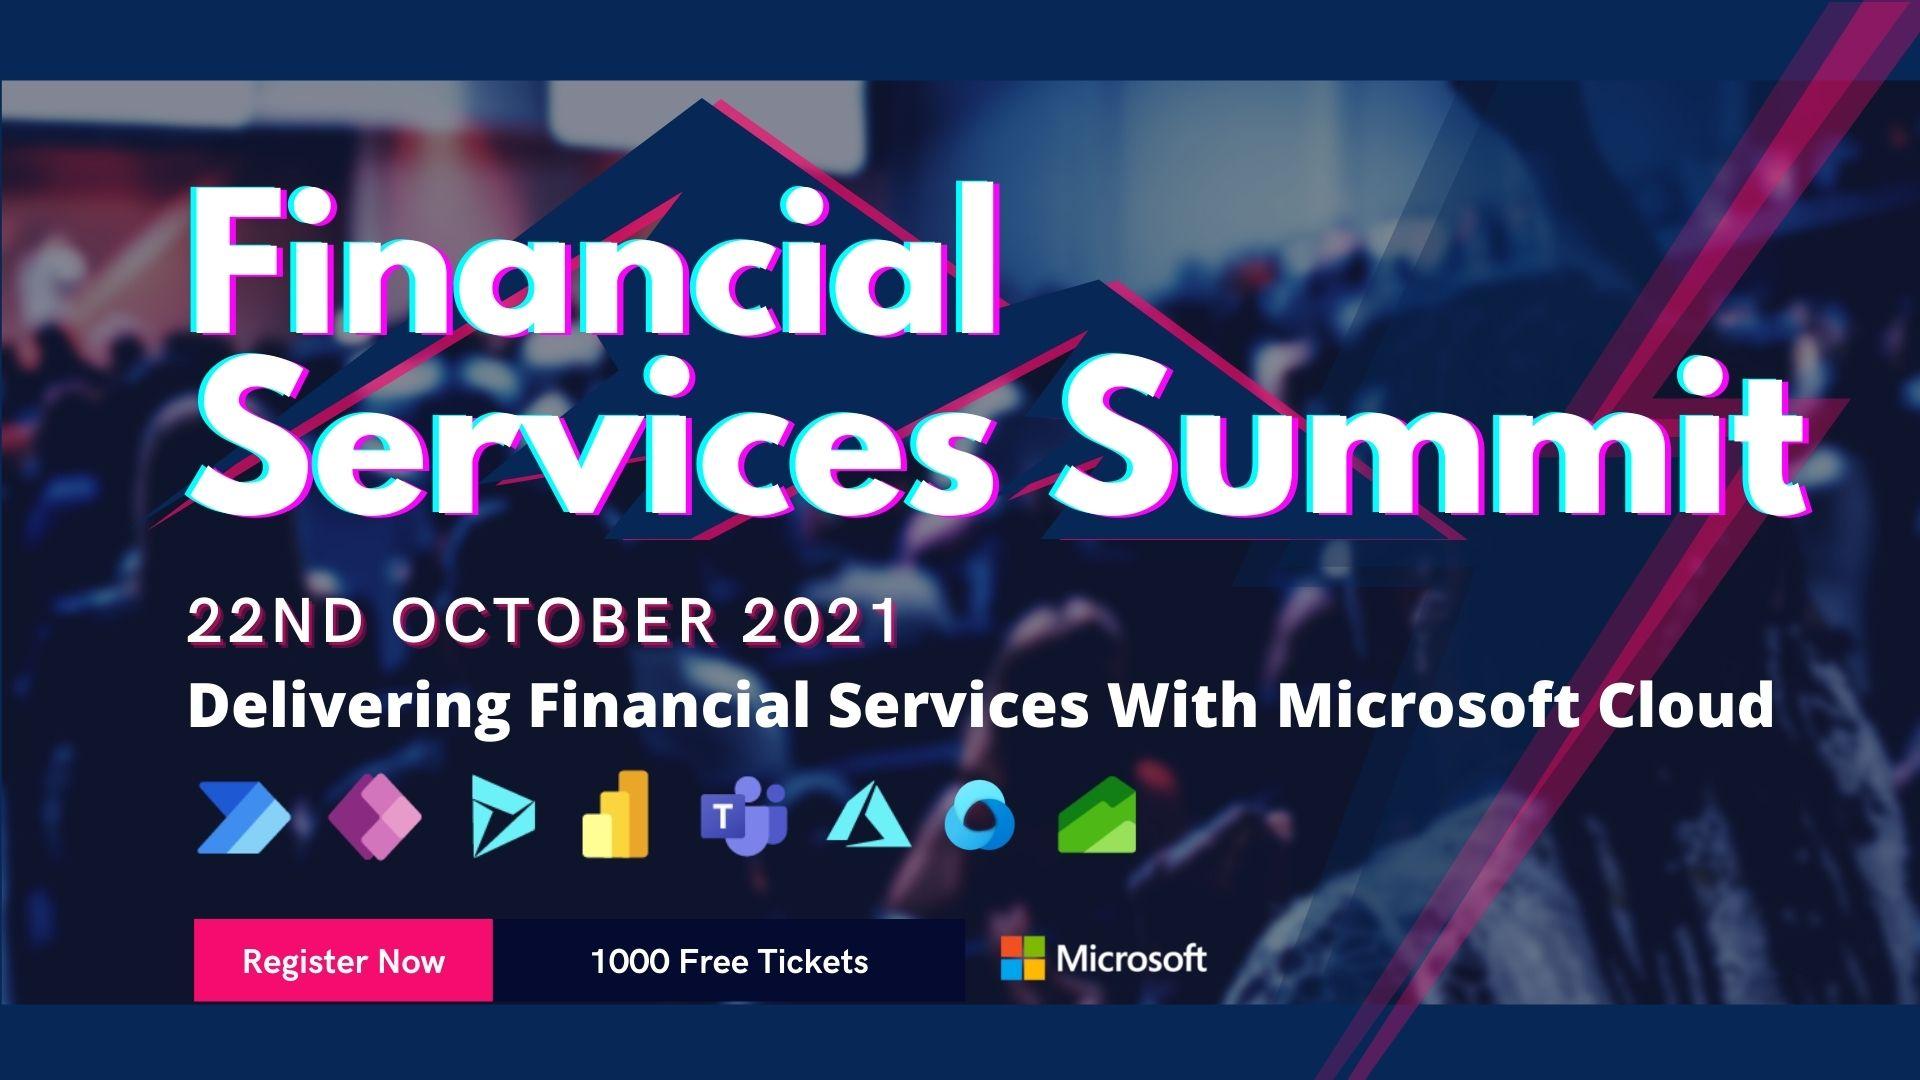 Microsoft 365 Financial Services Summit 2021